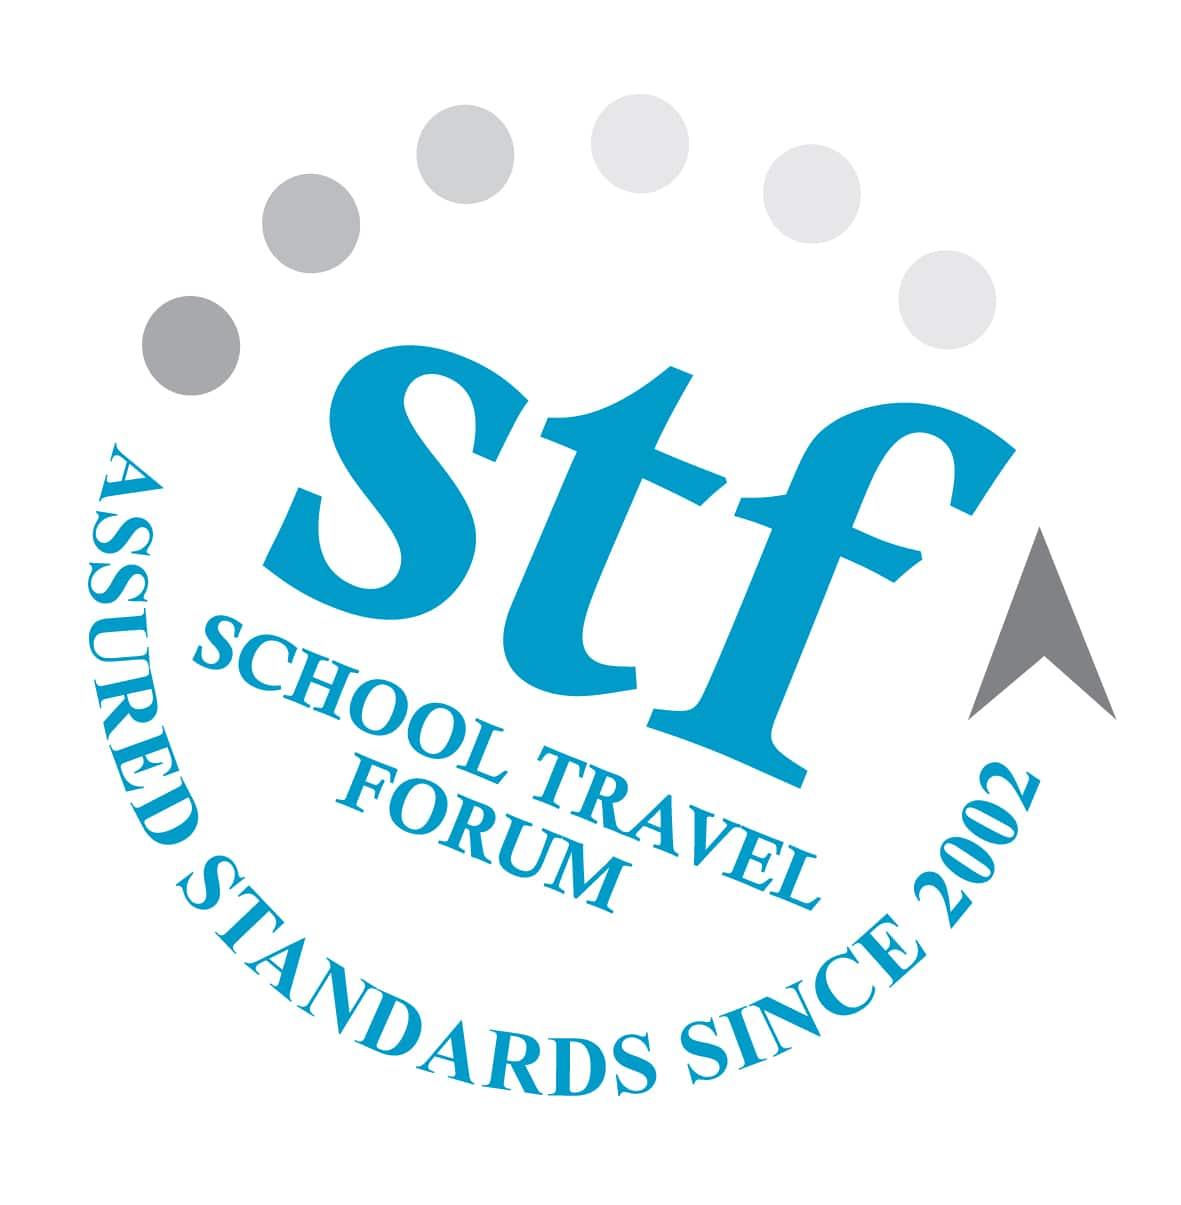 School Travel Forum logo